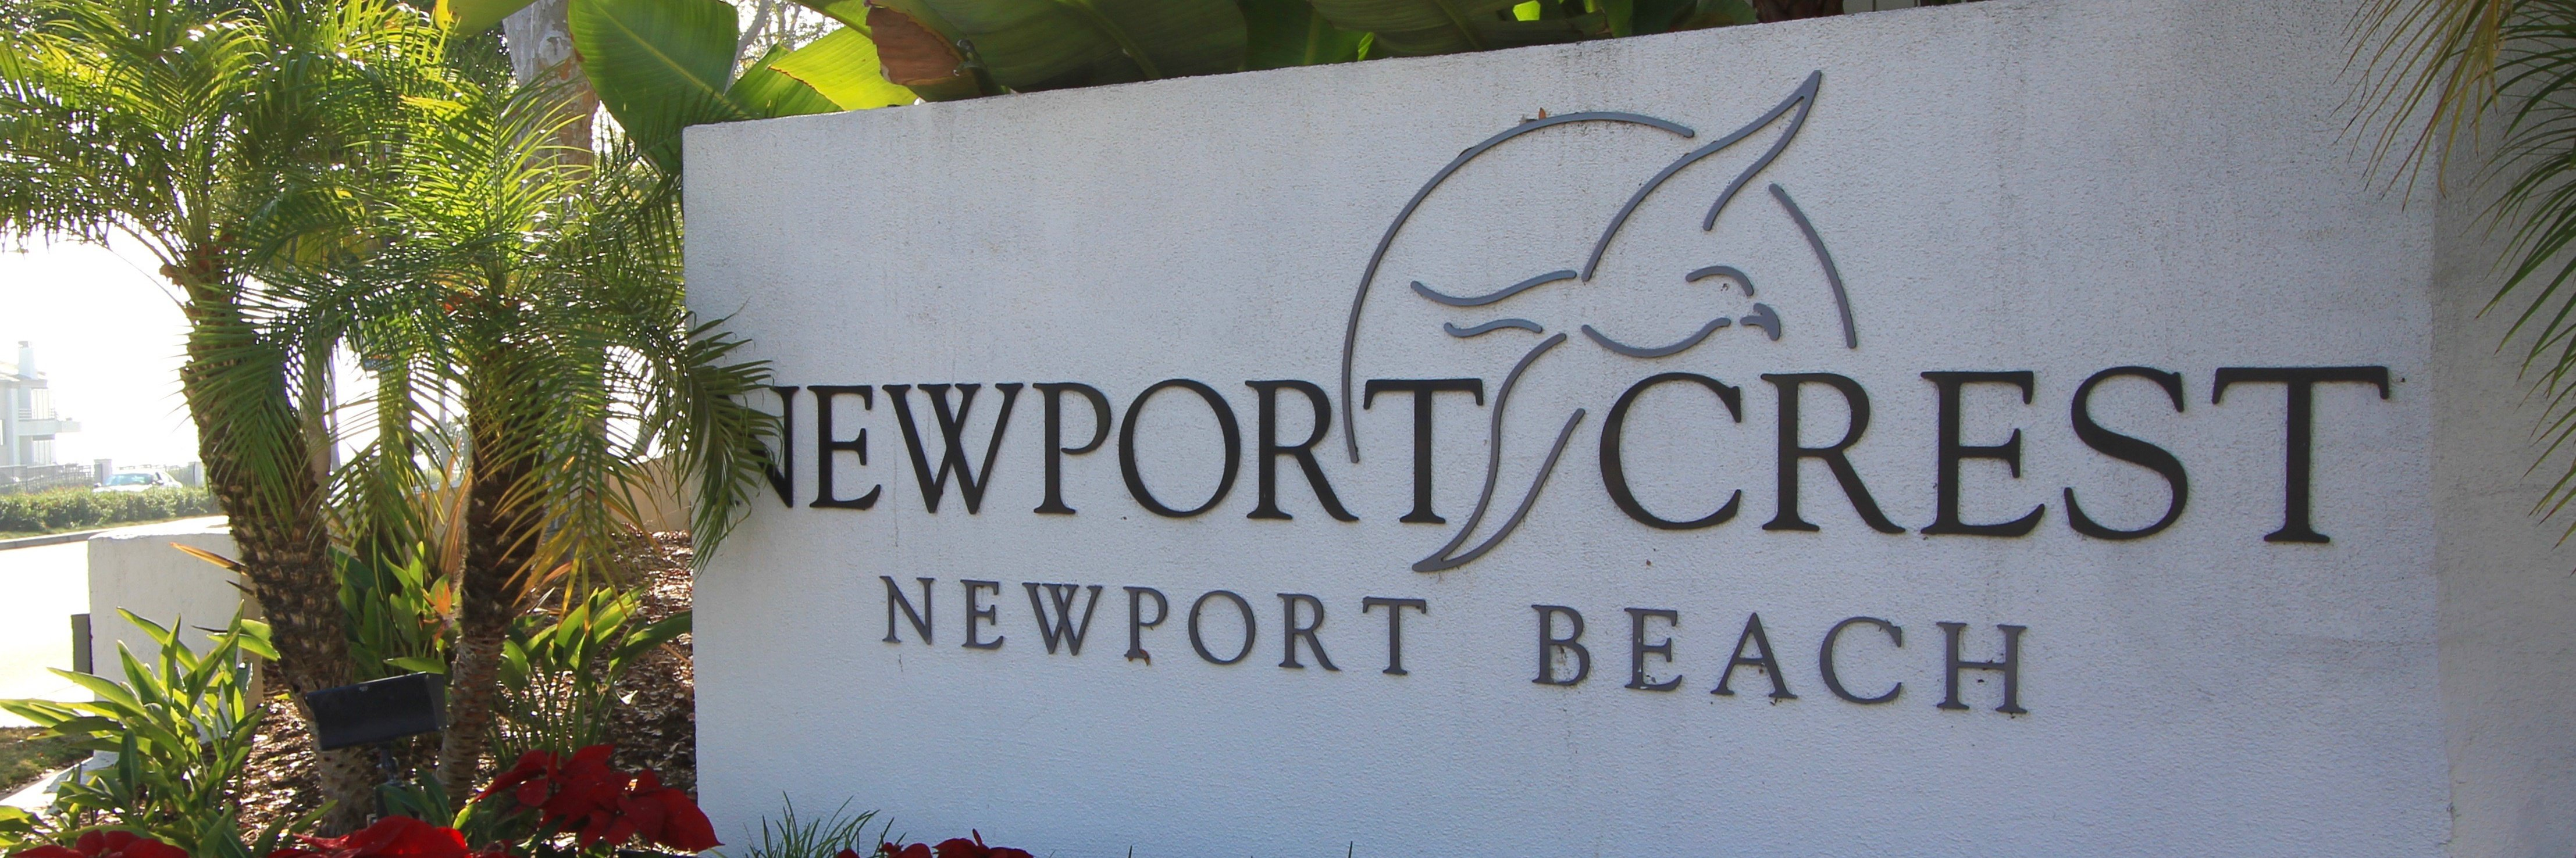 Newport Crest is a housing community in Newport Beach, CA